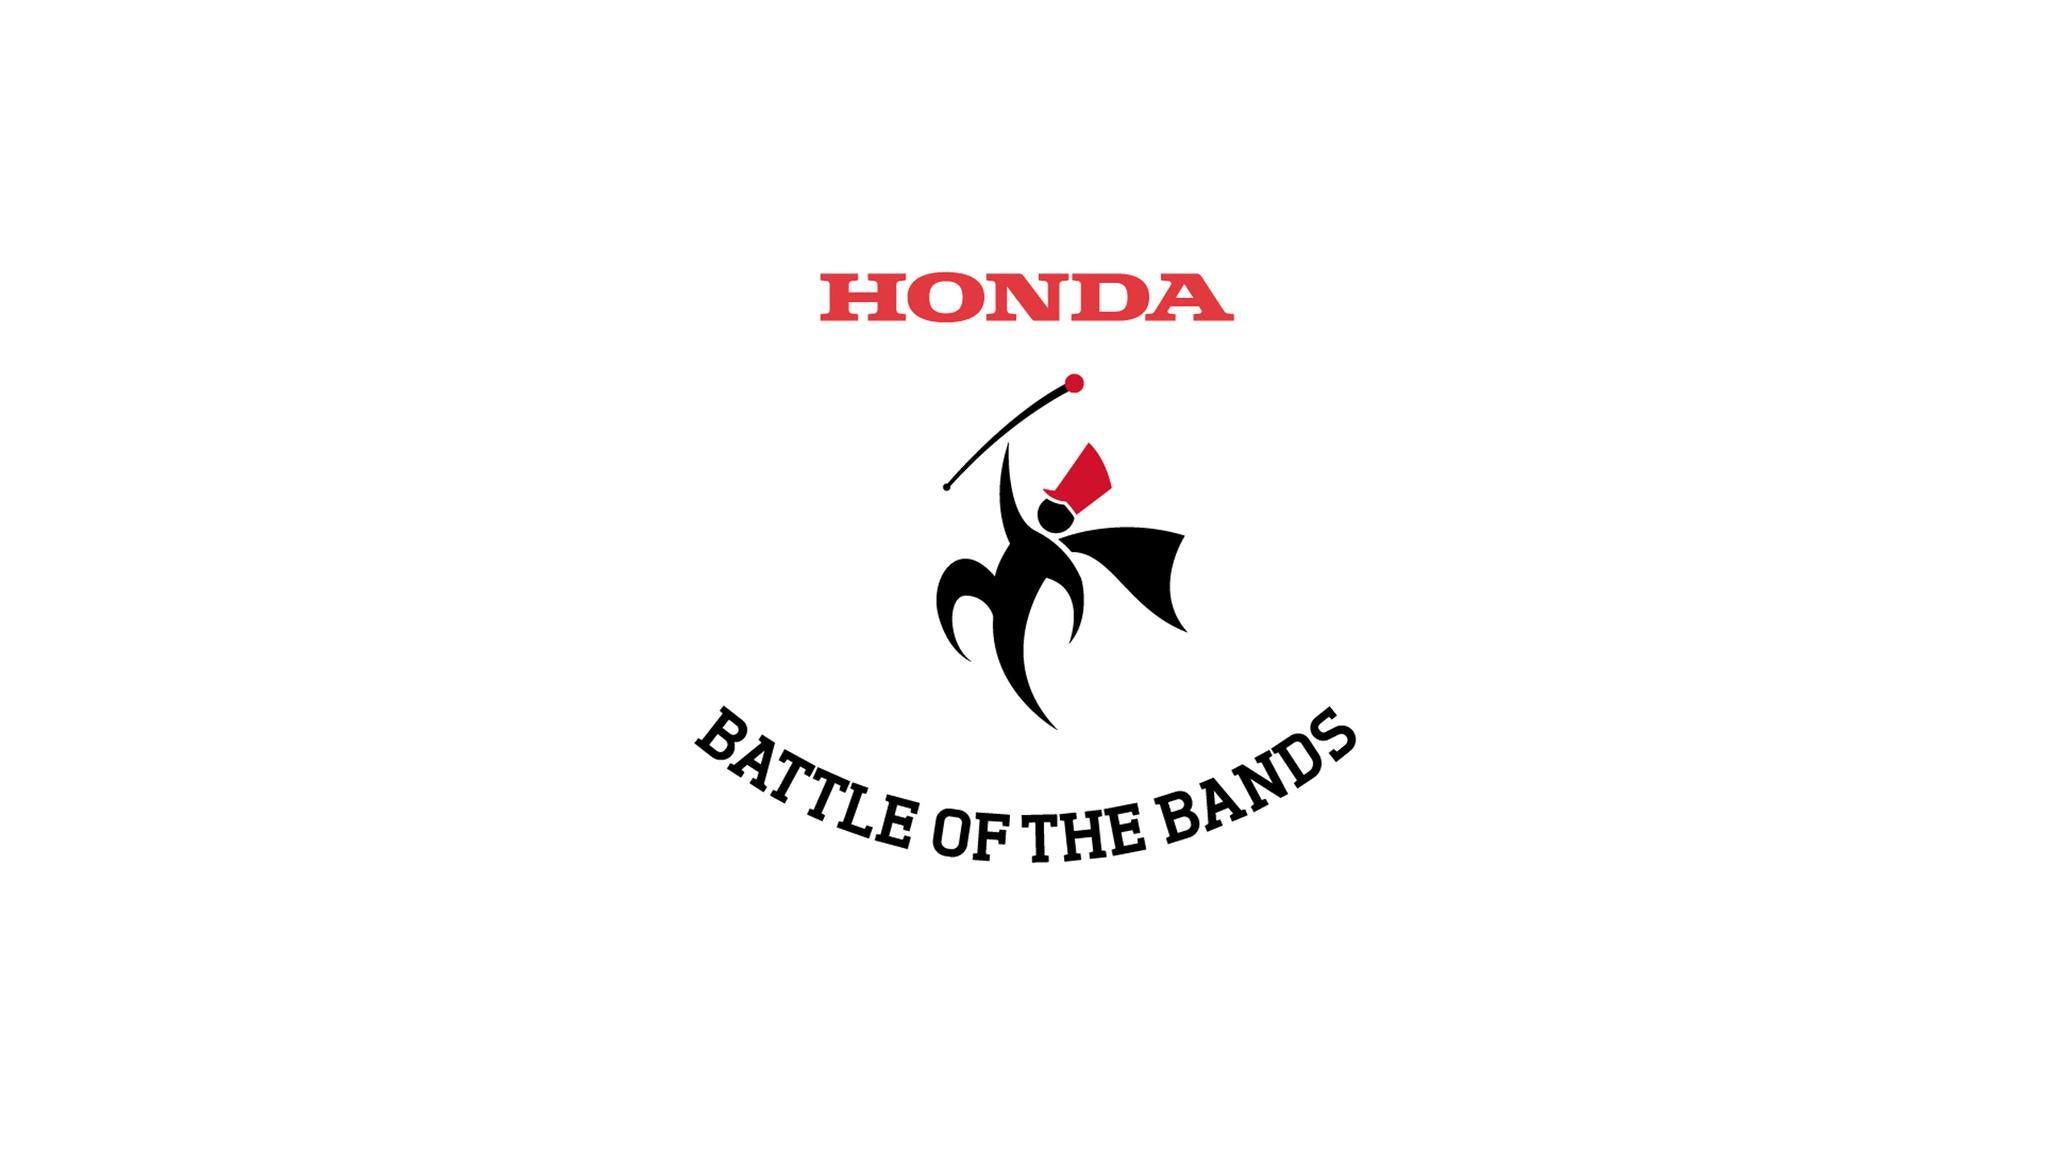 Honda Battle of the Bands at Georgia Dome - Atlanta, GA 30313